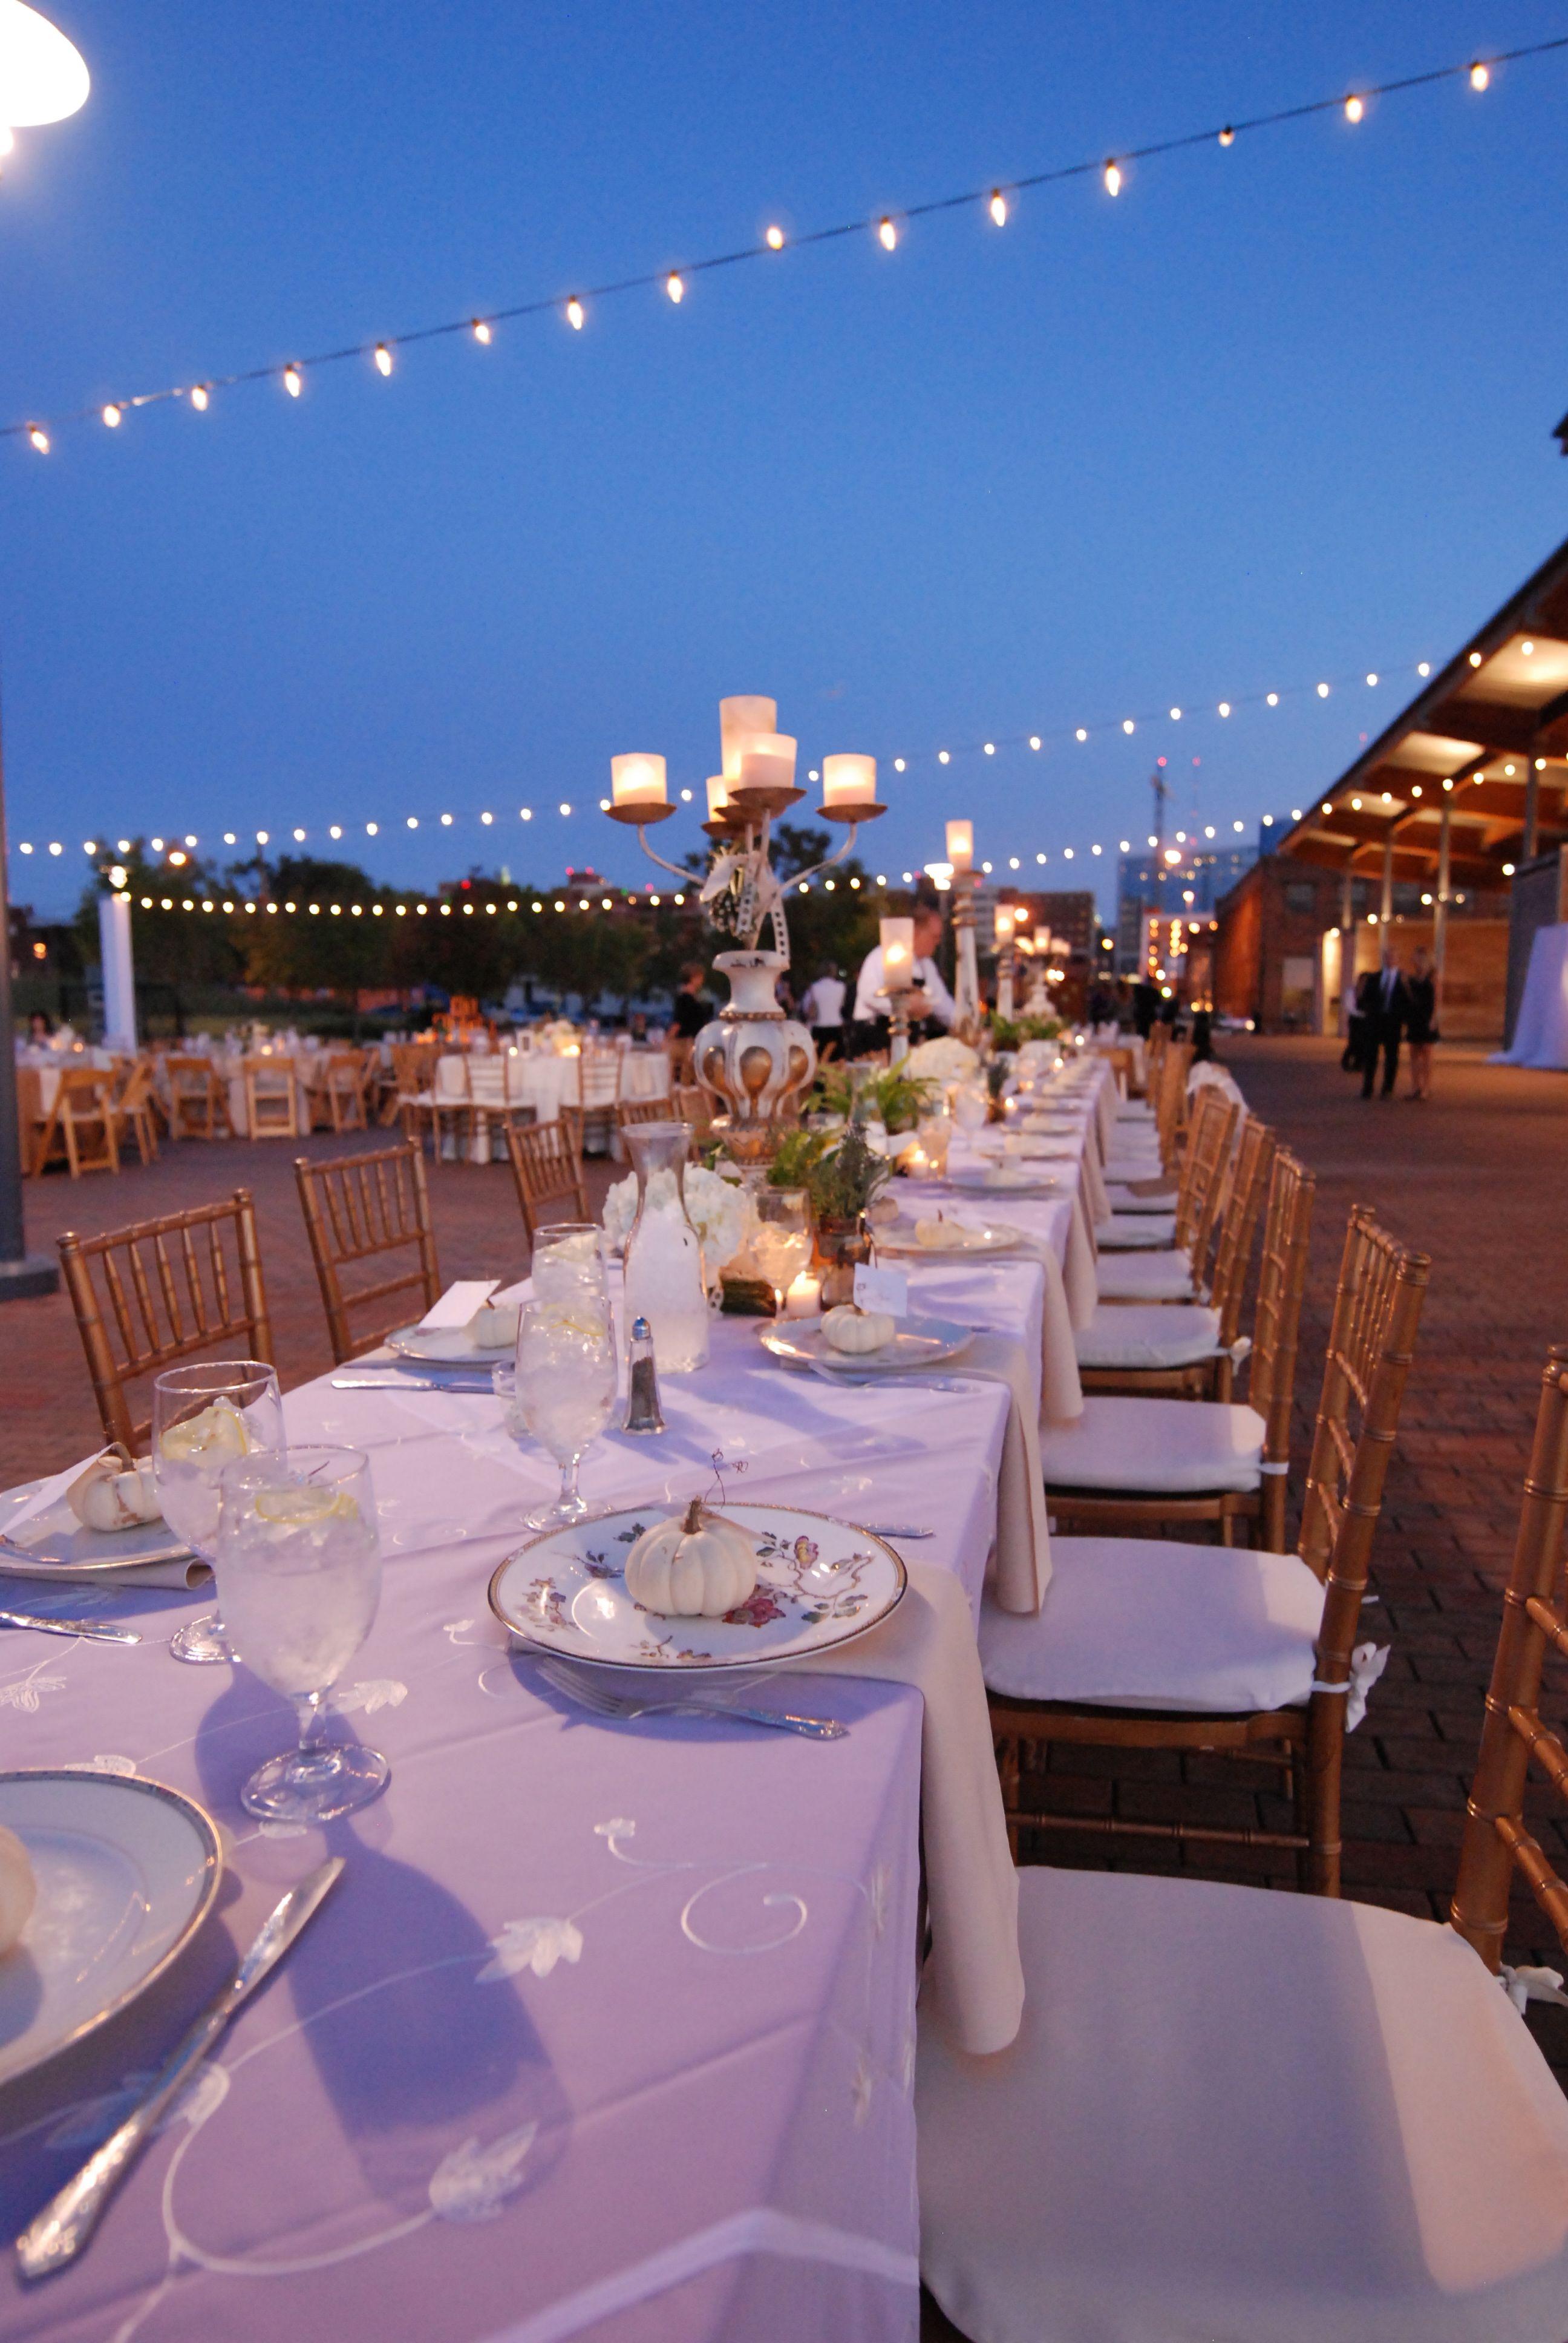 Wedding Event Lighting By Design Productions Birmingham Al